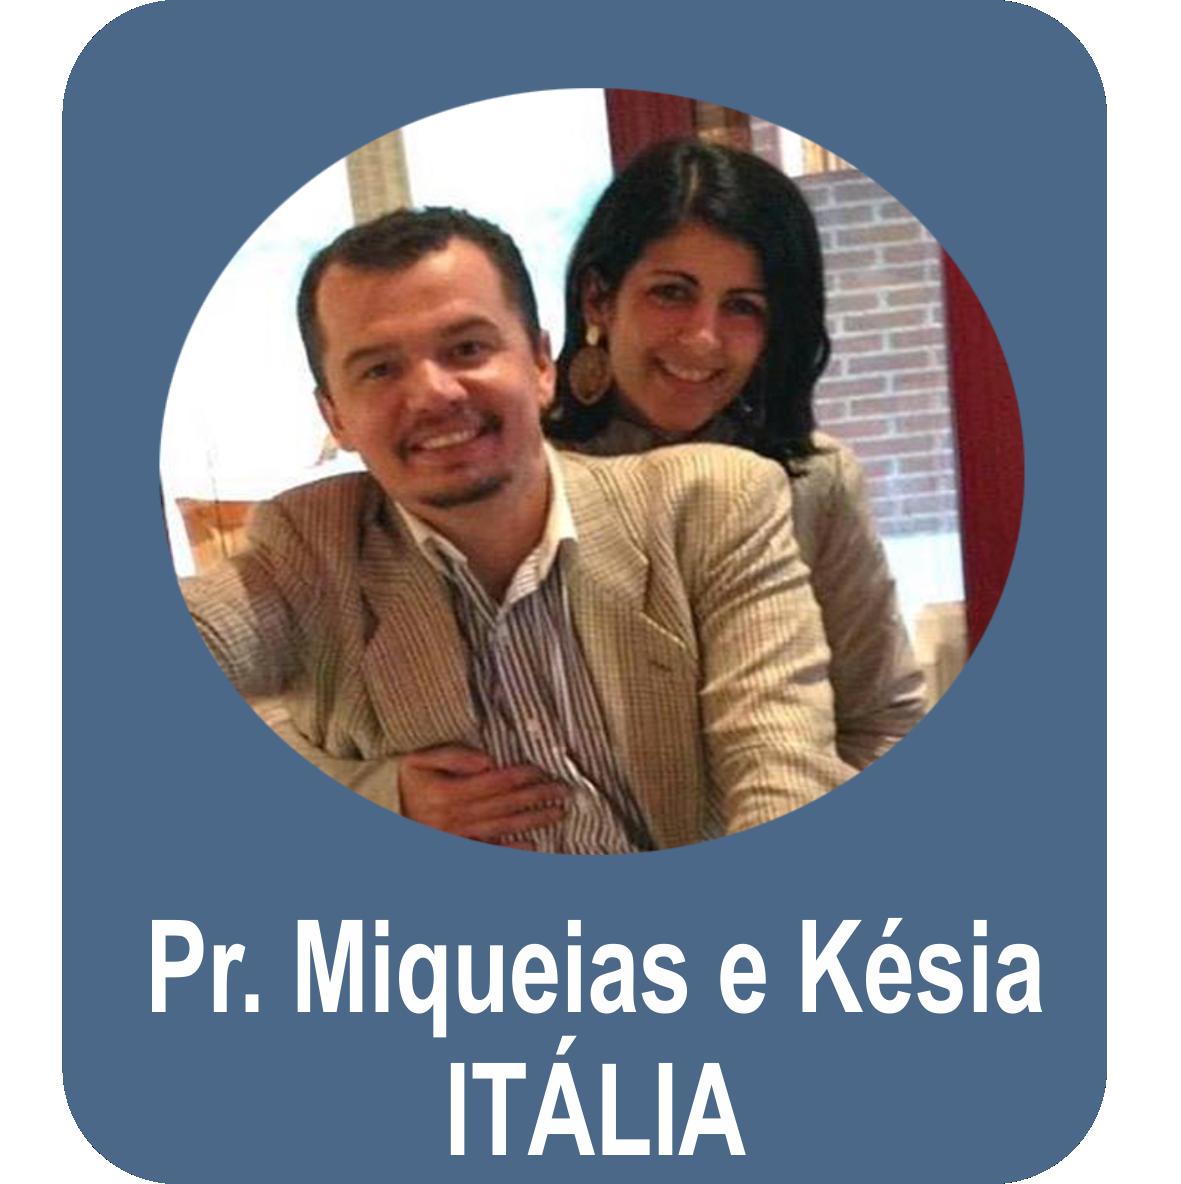 Pr. Miquéias Visoto e Miss. Késia - ITÁLIA - Vicenza